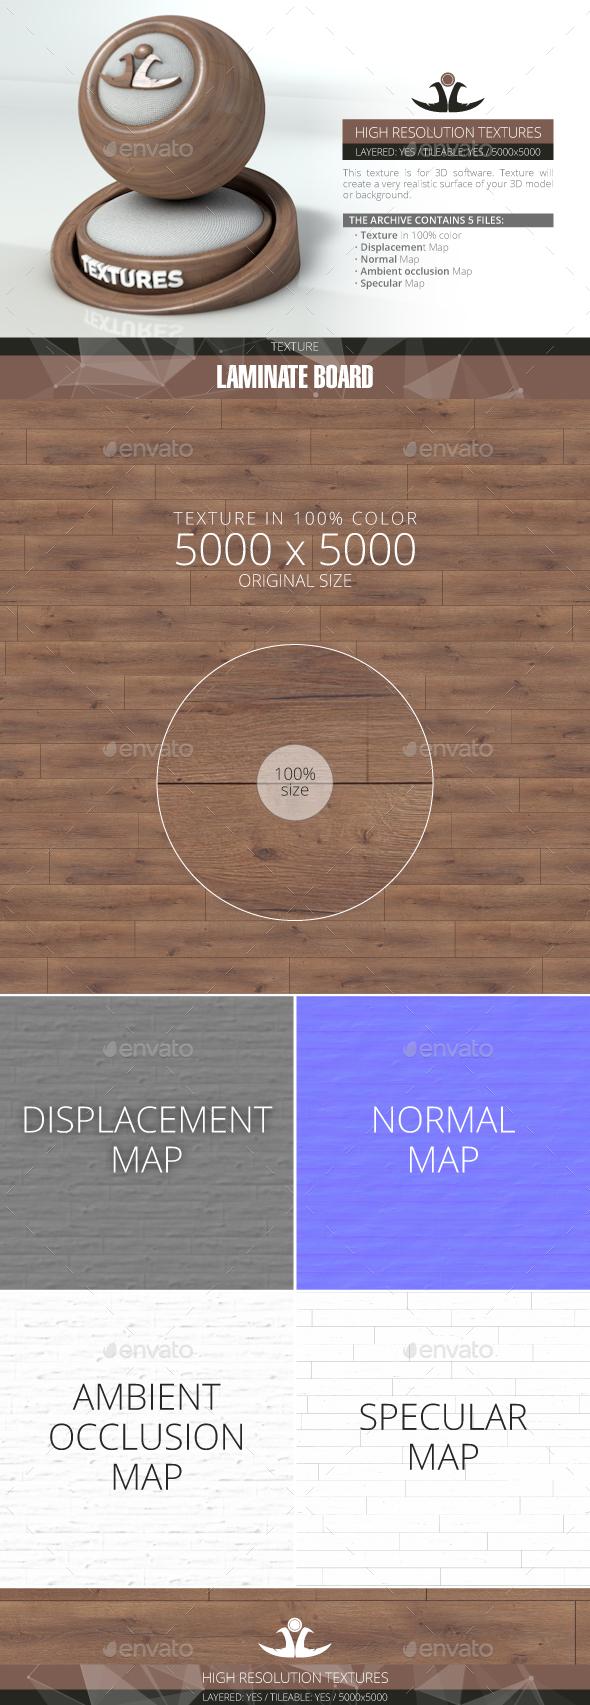 Laminate Board 66 - 3DOcean Item for Sale